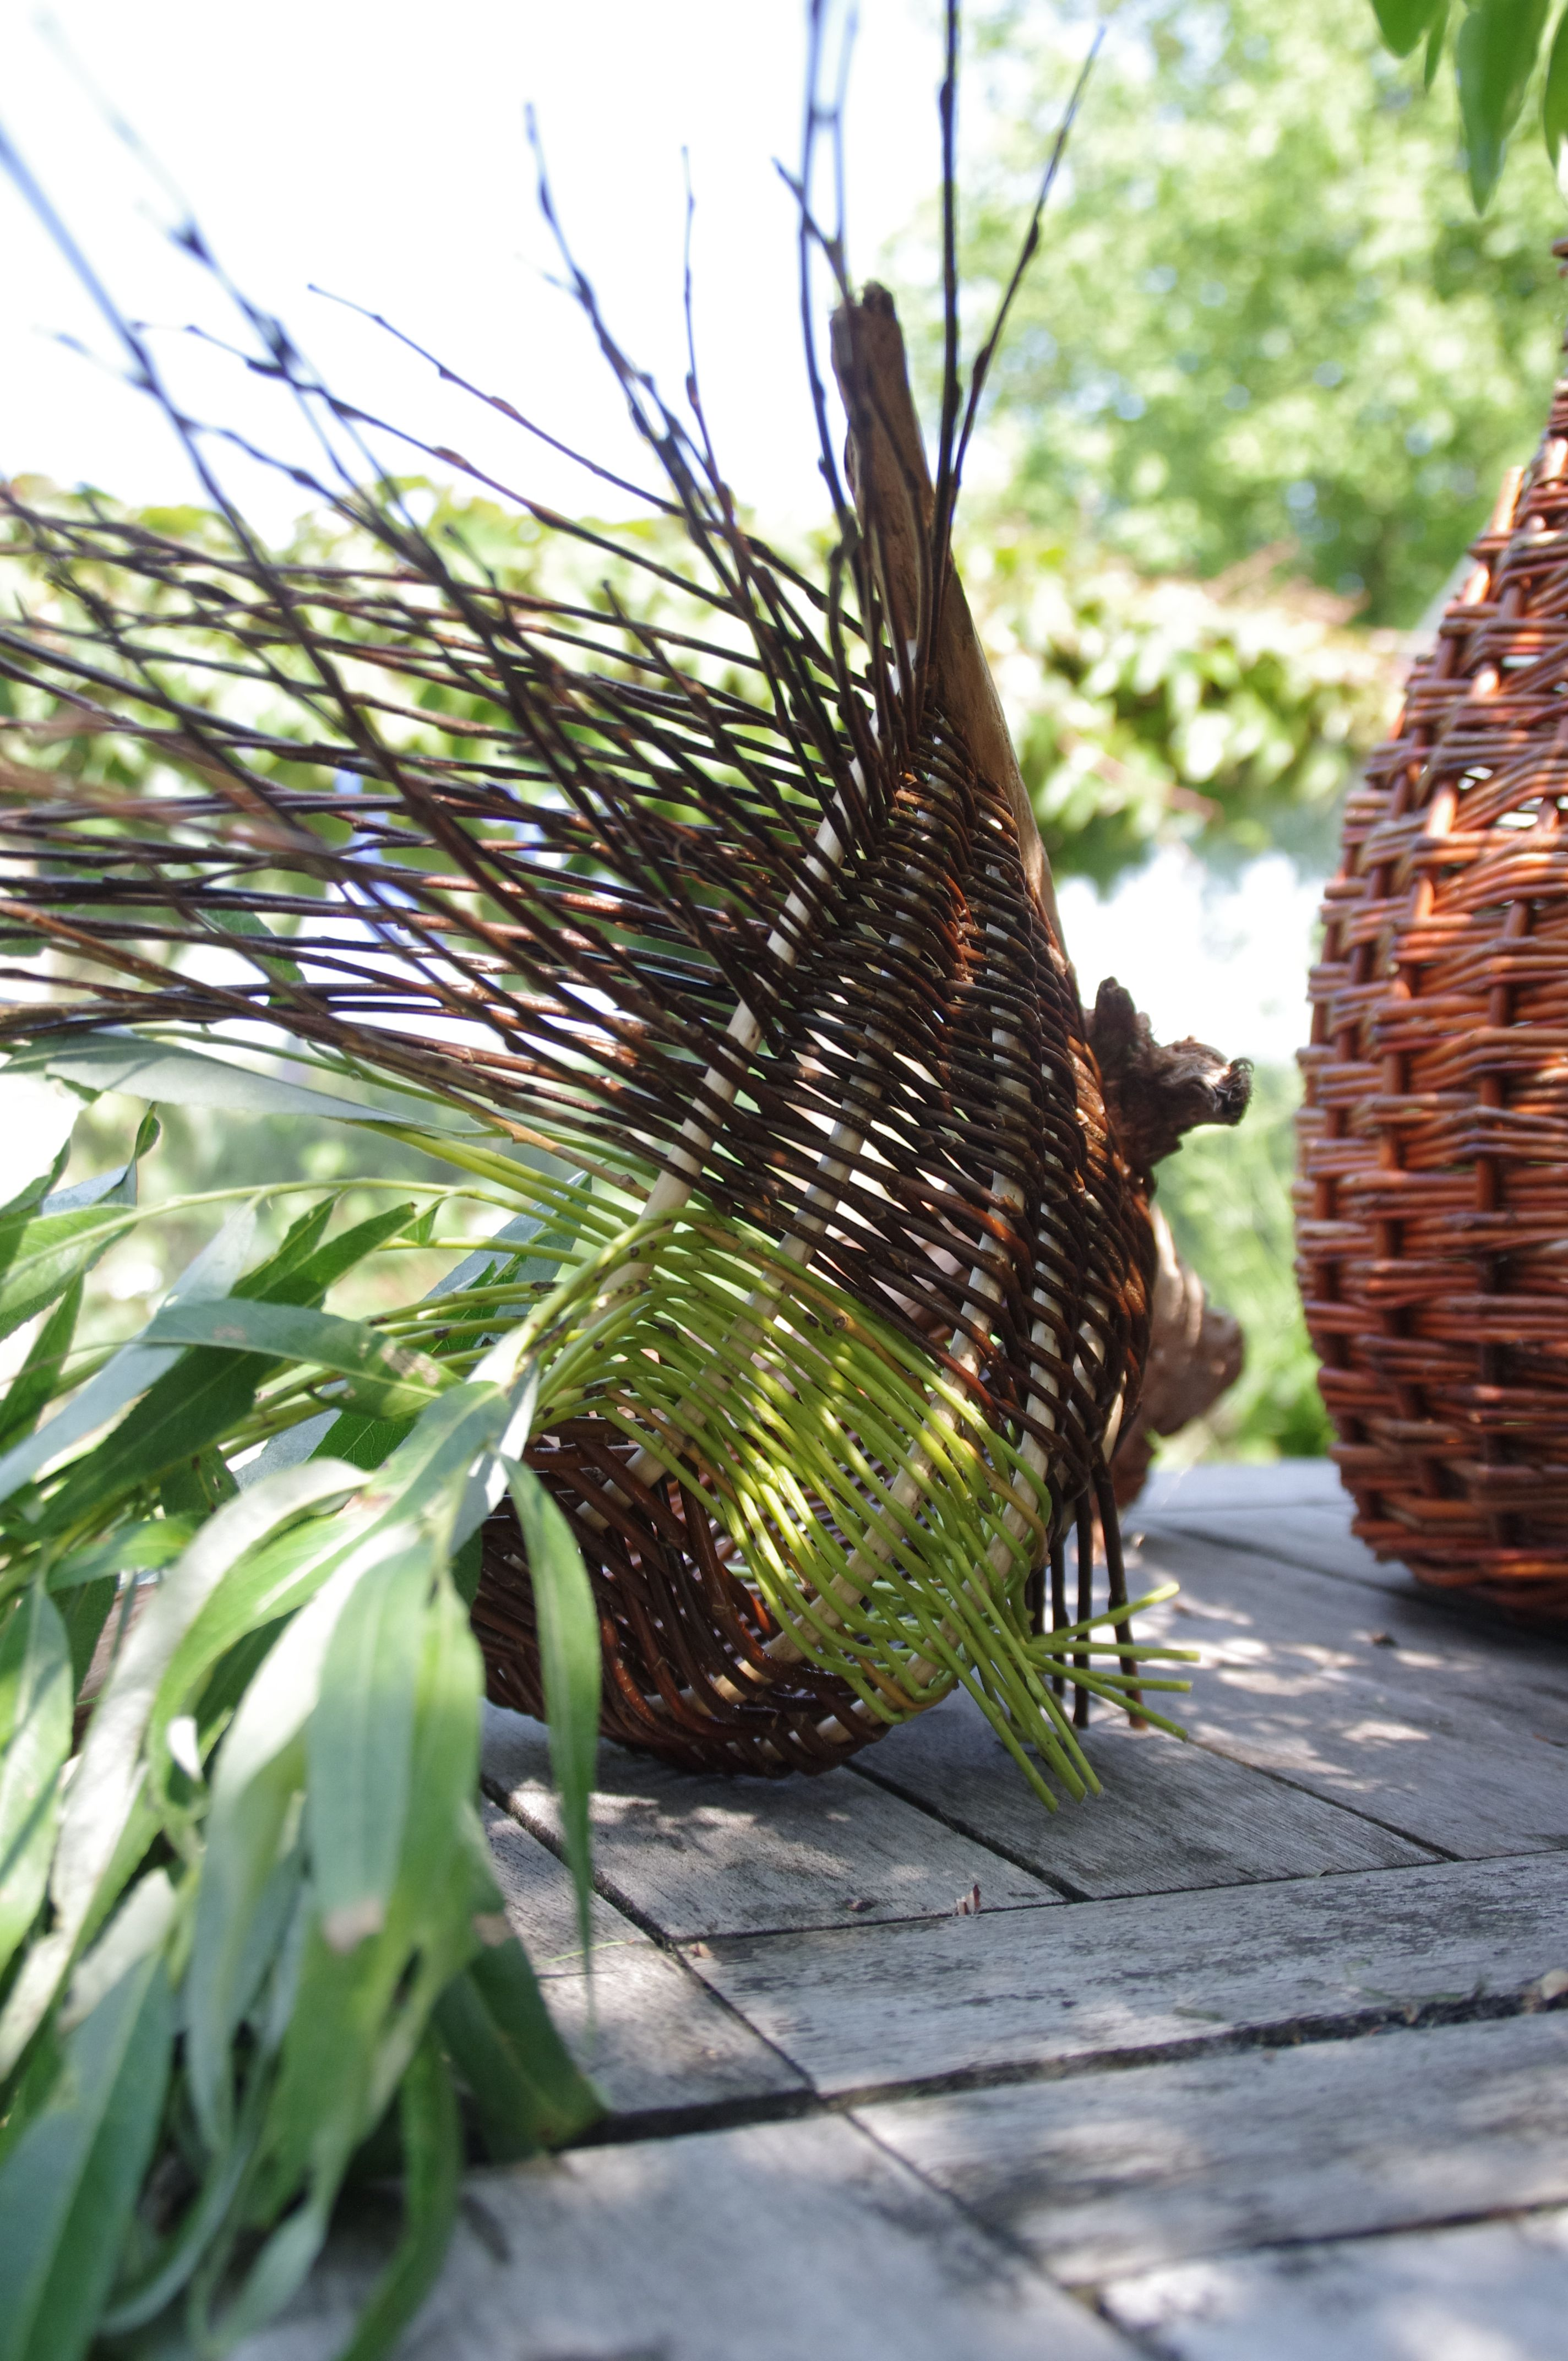 Willow basket by Anja van der Veer (With images) Fiber